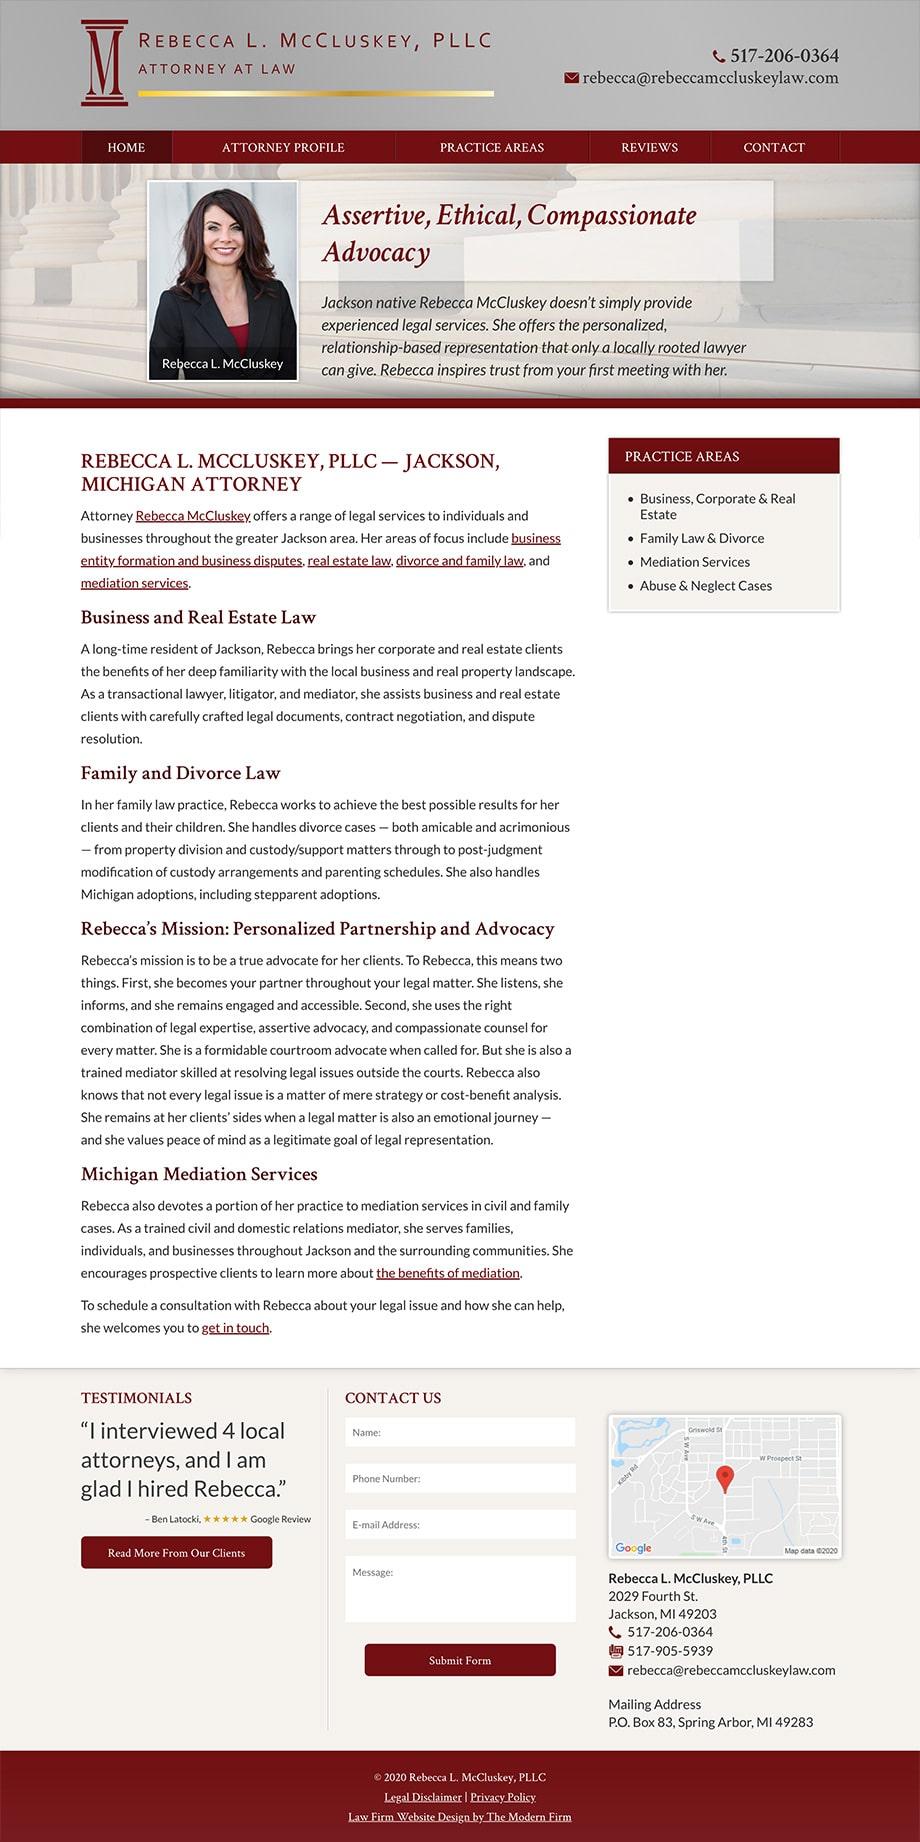 Law Firm Website Design for Rebecca L. McCluskey, PLLC